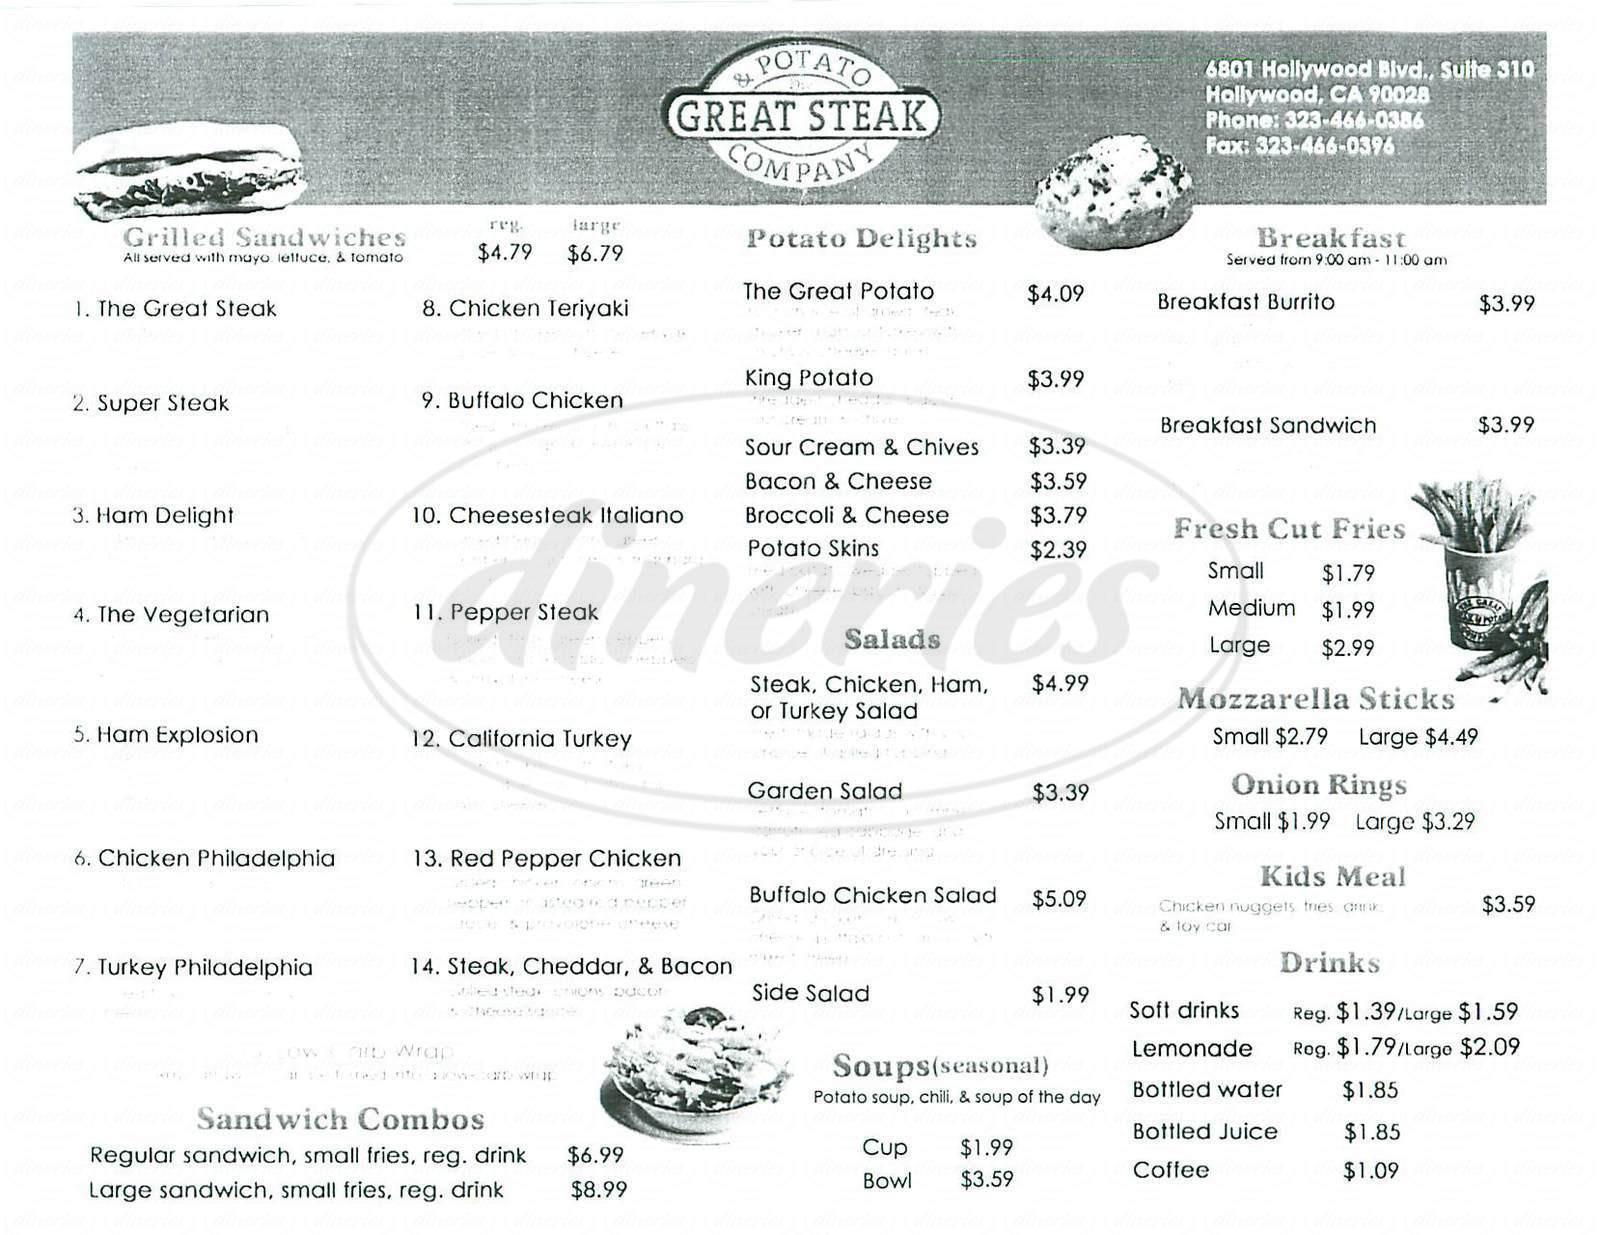 Great Steak And Potato  Great Steak & Potato pany Menu Los Angeles Dineries